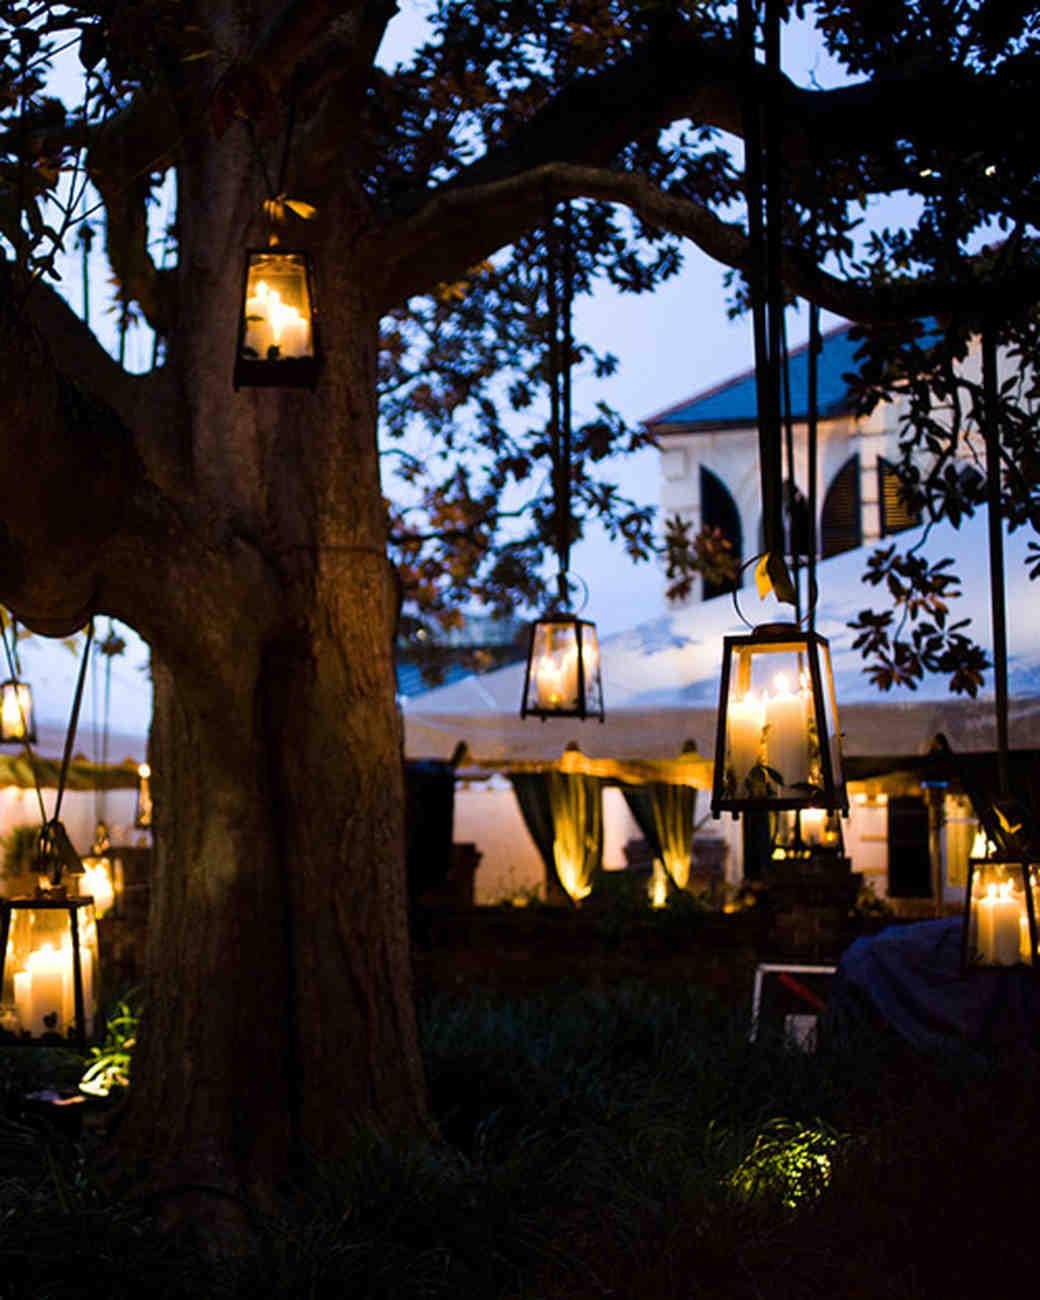 Outdoor Hanging Tree Lights: 47 Hanging Wedding Décor Ideas